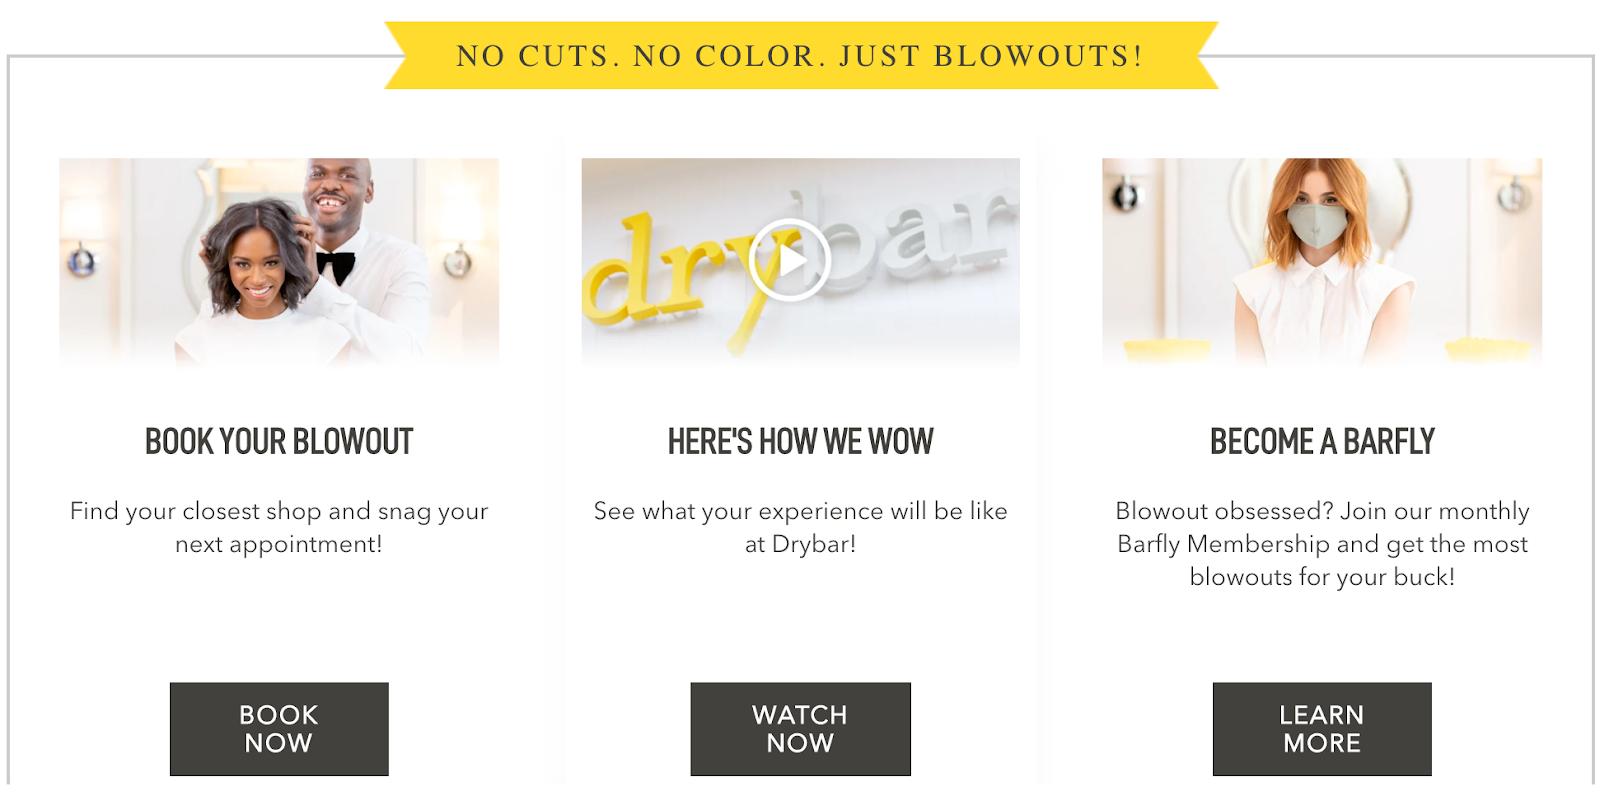 Drybar a niche hair salon that only does blowouts